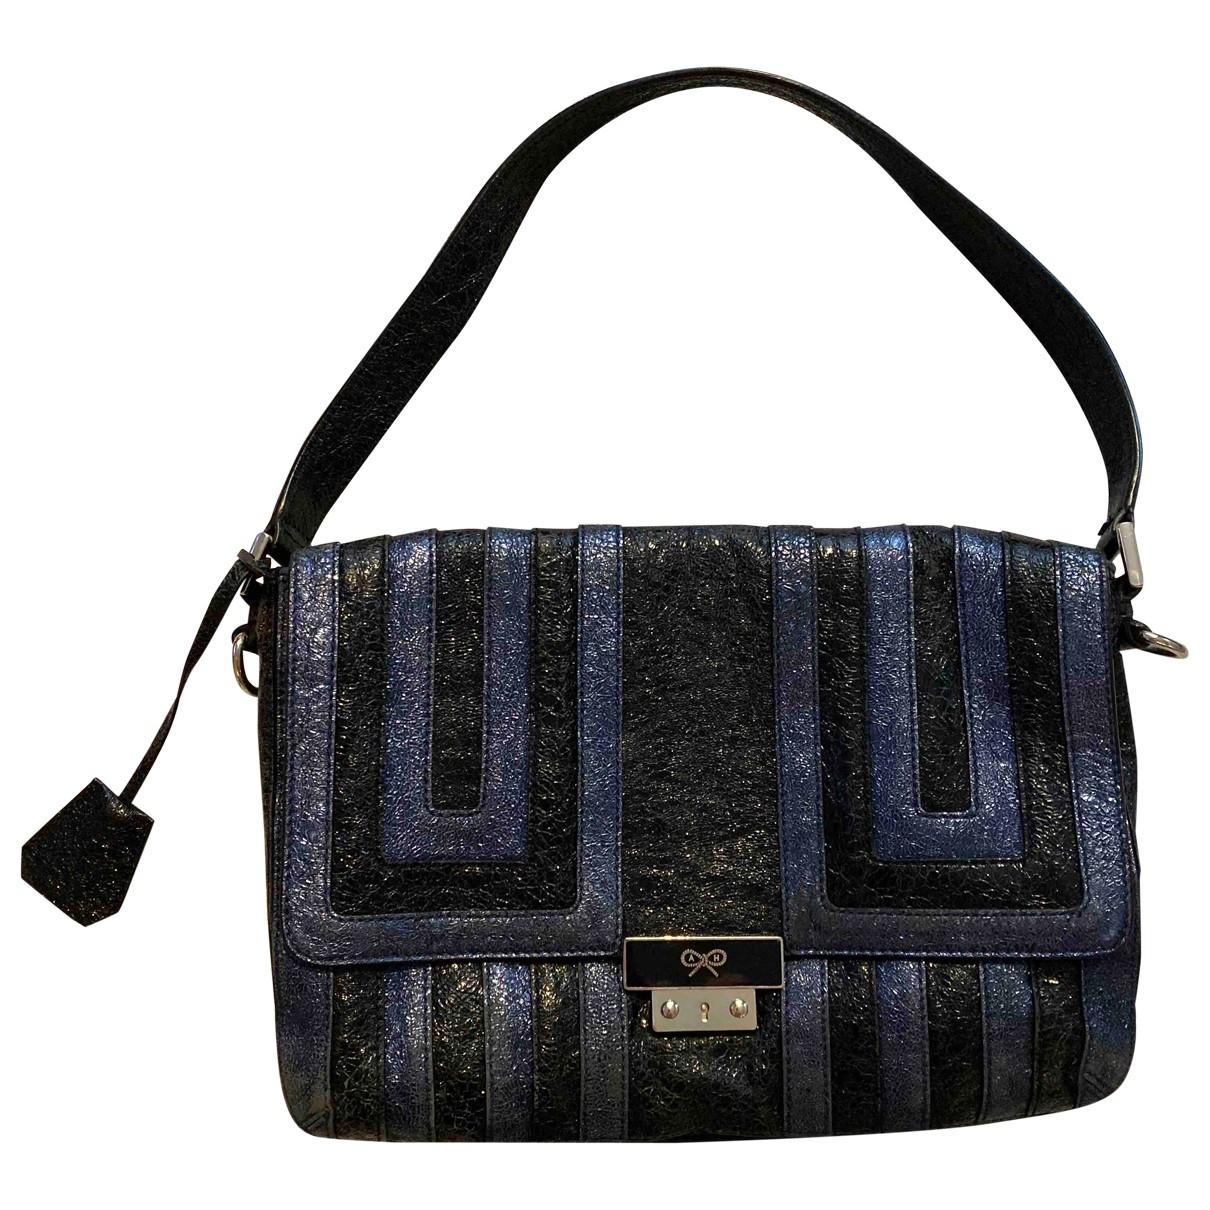 Anya Hindmarch \N Black Patent leather handbag for Women \N